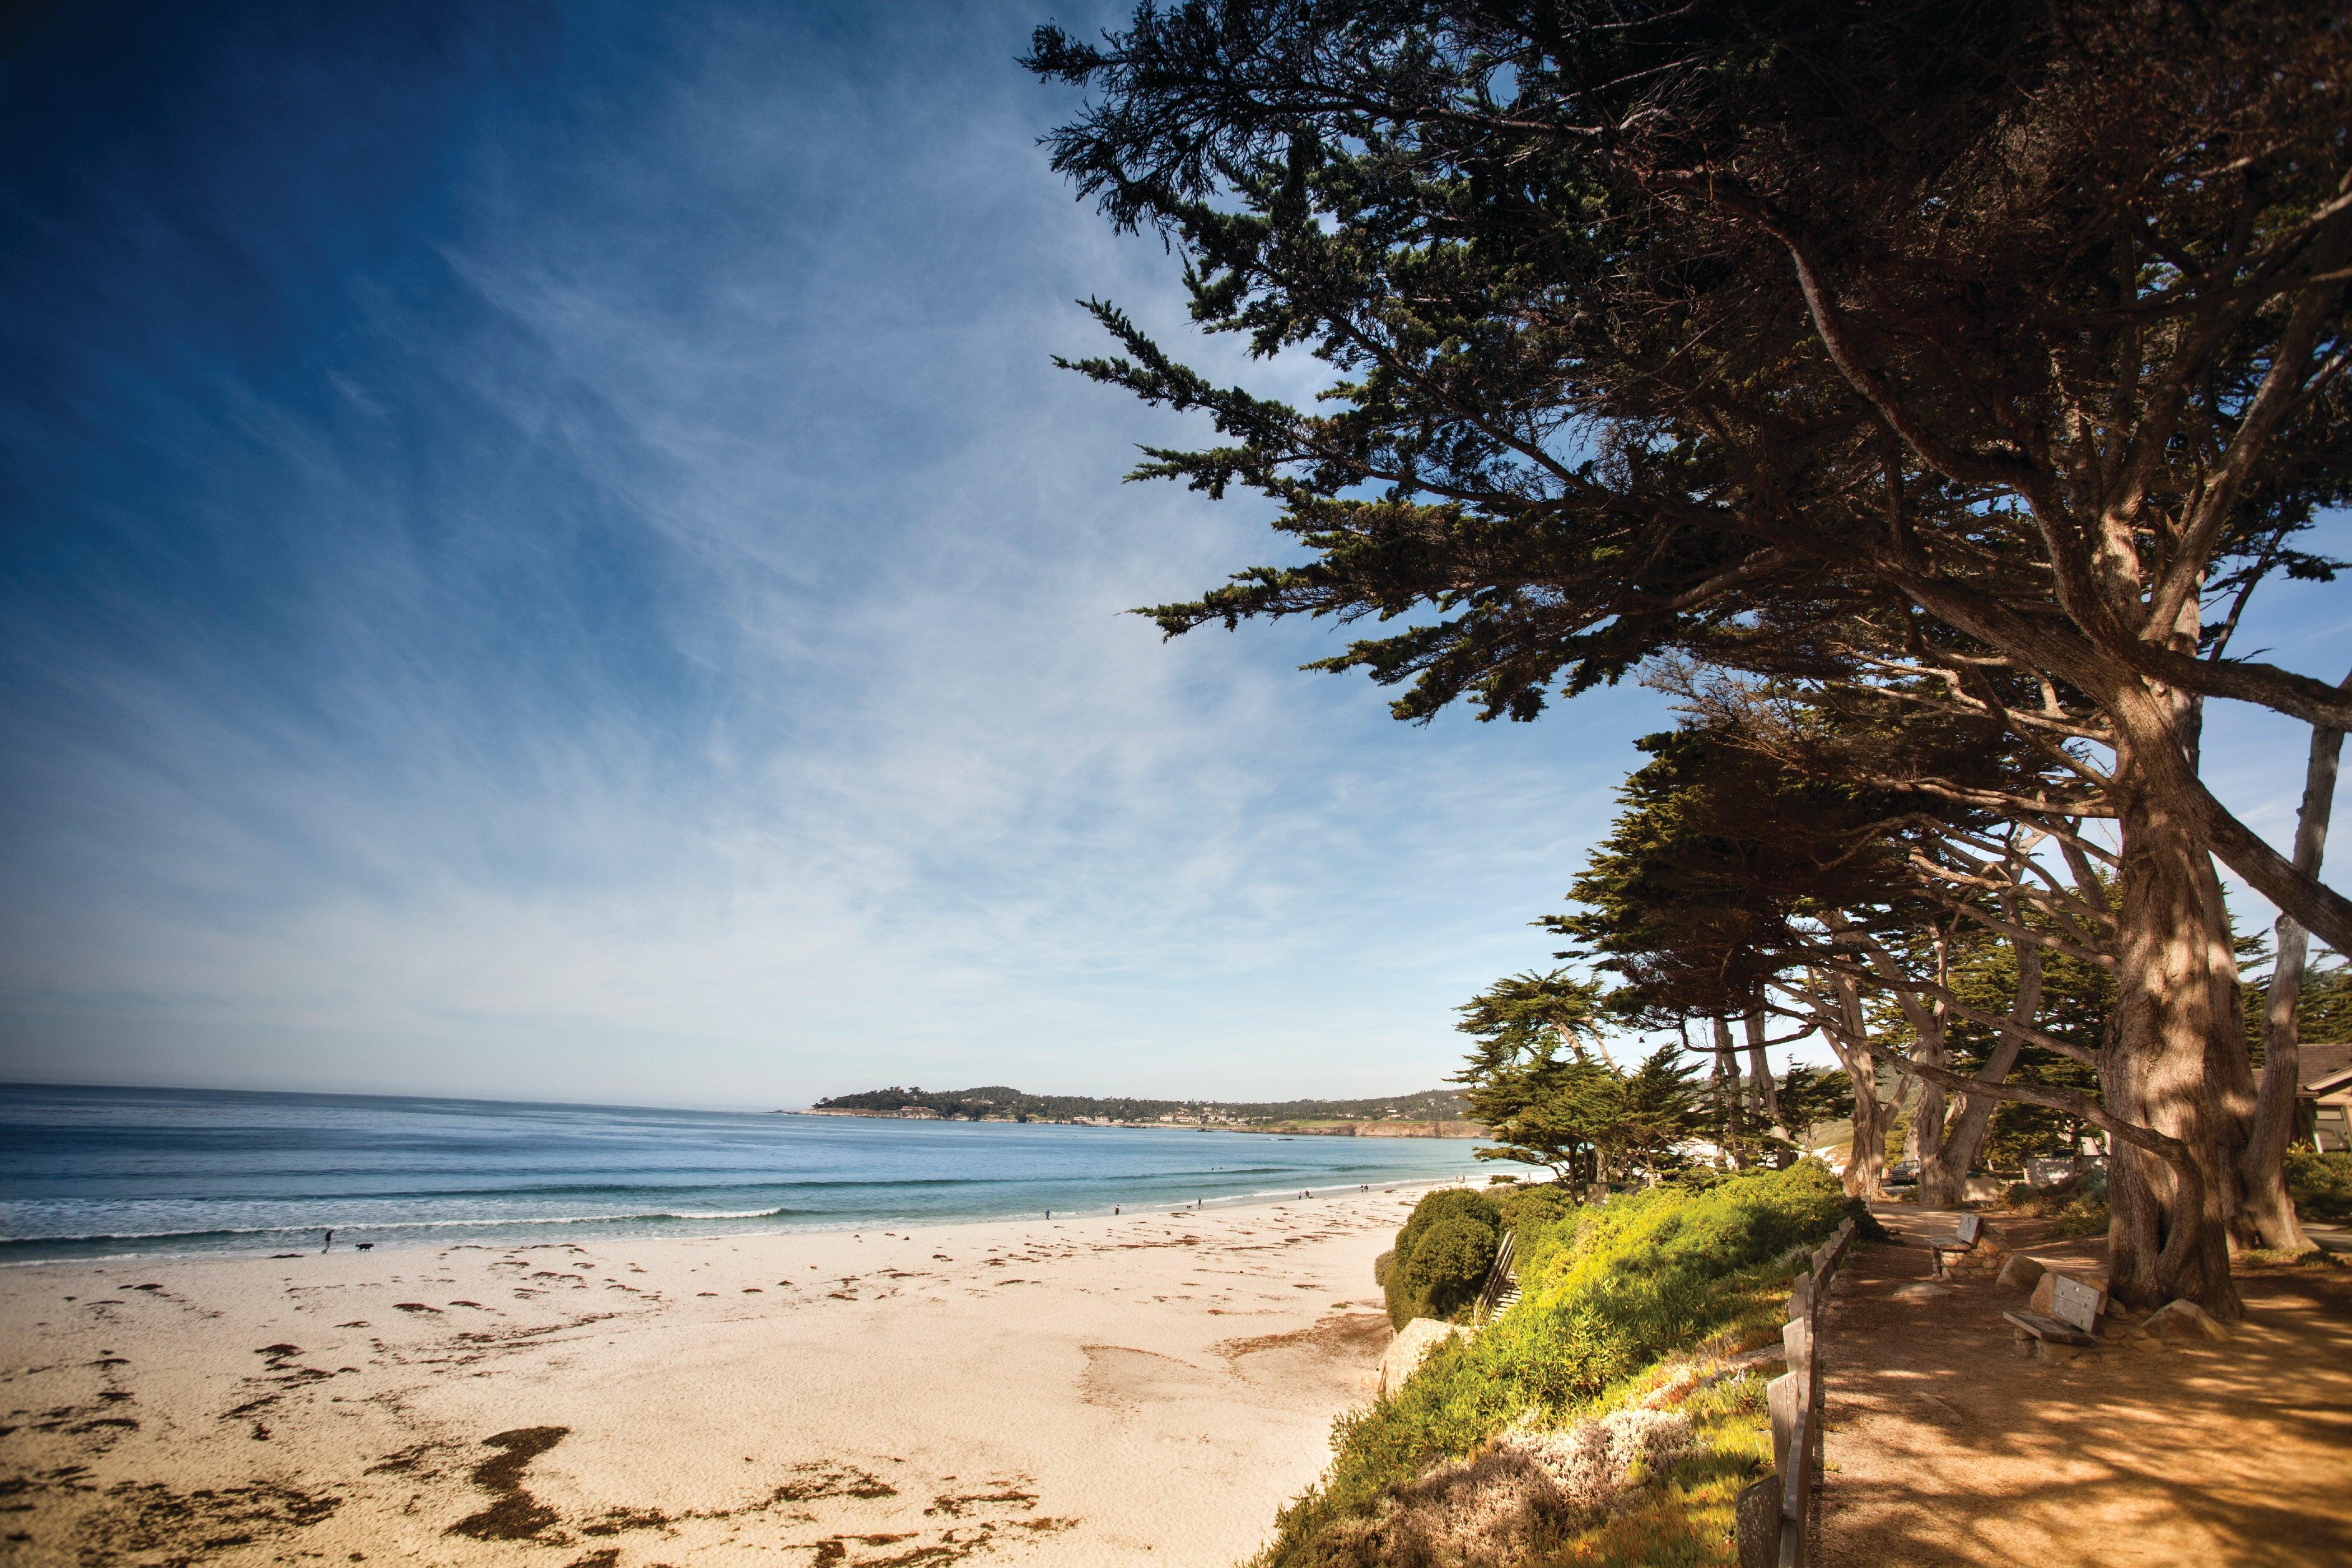 Run by the Pacific Ocean coastline in Carmel, California .